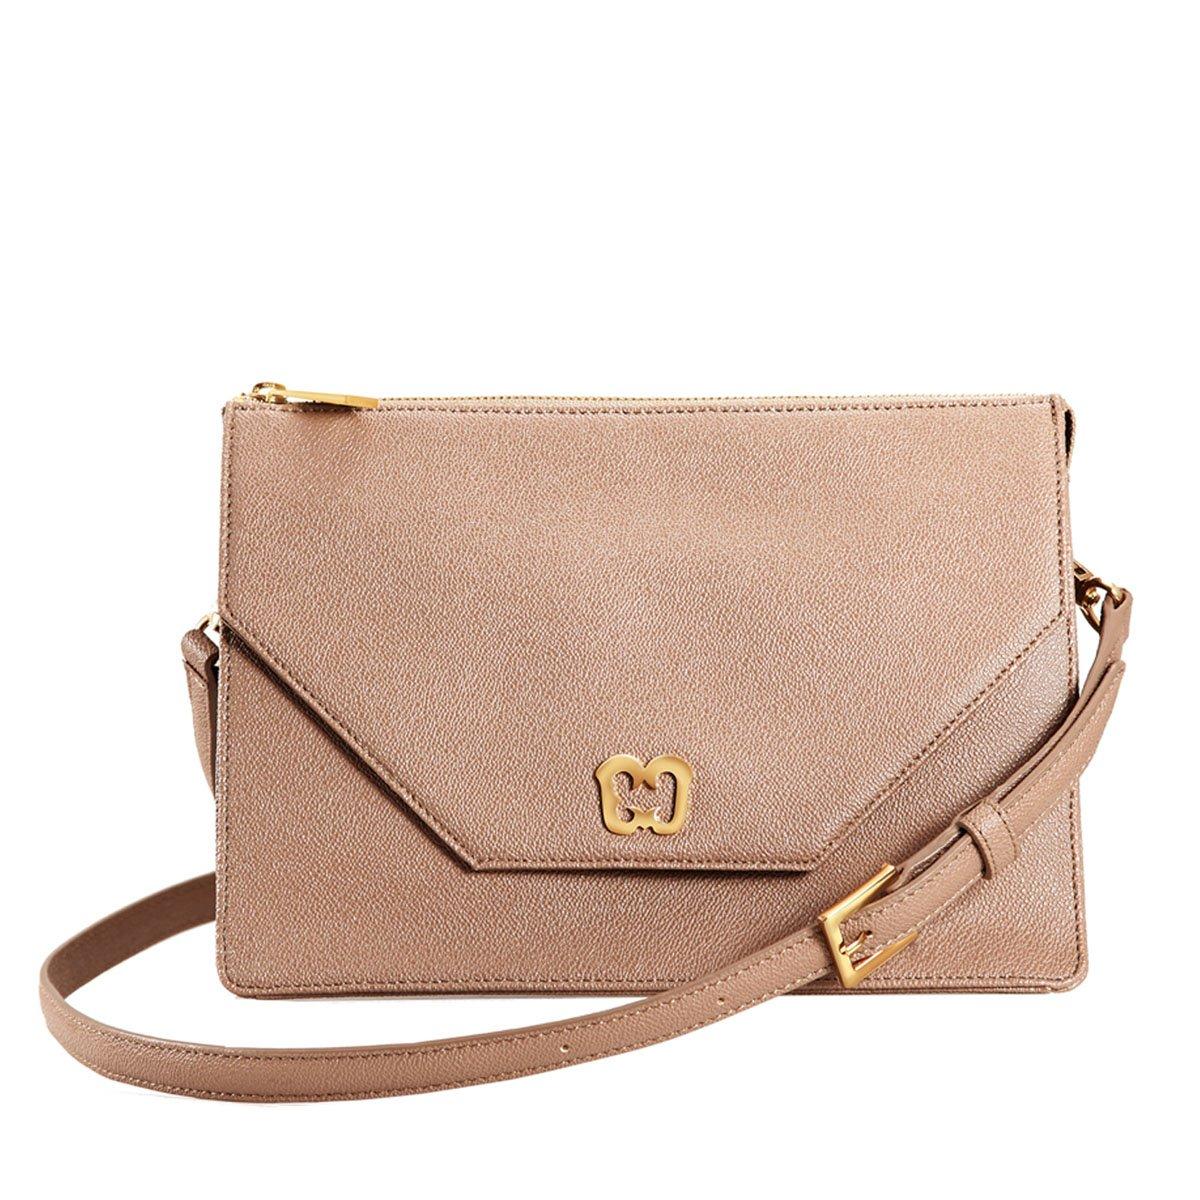 Eric Javits Designer Women's Luxury Handbag - Krysta - Latte